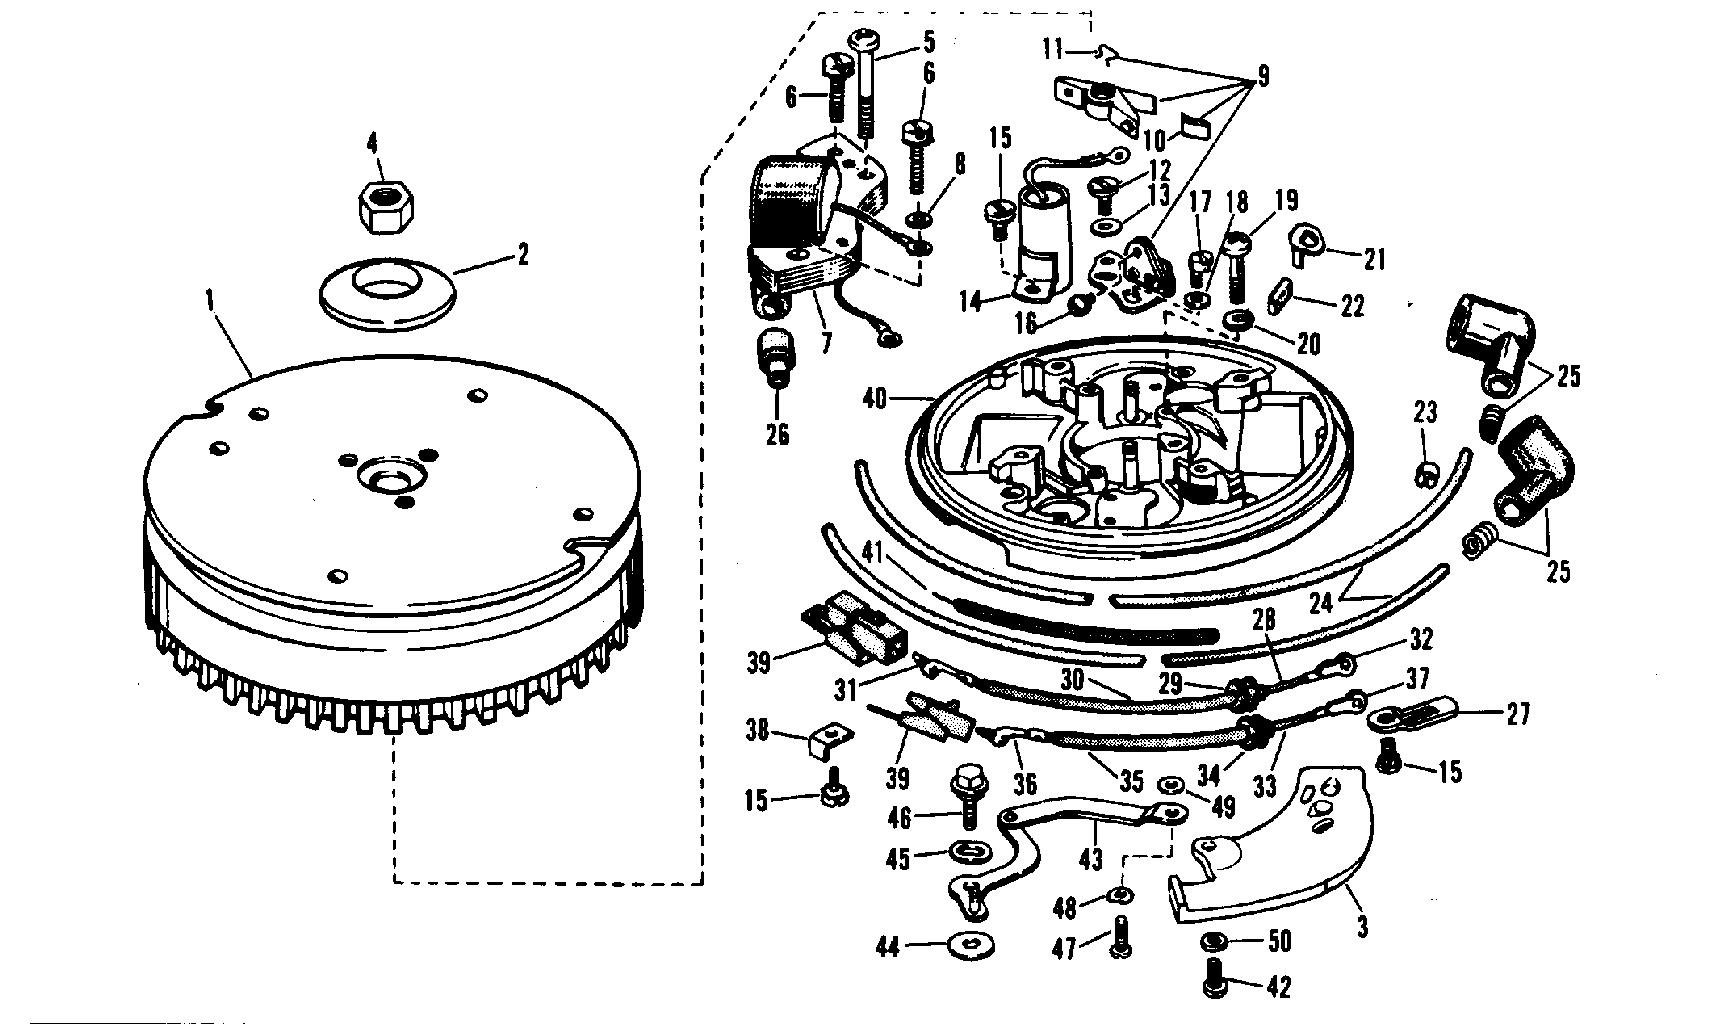 BRP   JOHNSON - EN   1969   9.50   9R69S 1969   MAGNETO GROUP ... Omc Magneto Wiring Diagram on ace wiring diagram, apc wiring diagram, sea ray wiring diagram, omg wiring diagram, viking wiring diagram, regal wiring diagram, chris craft wiring diagram, john deere wiring diagram, nissan wiring diagram, omc schematic diagrams, sears wiring diagram, 1972 50 hp evinrude wiring diagram, chevrolet wiring diagram, atlas wiring diagram, 96 evinrude wiring diagram, evinrude key switch wiring diagram, johnson wiring diagram, clark wiring diagram, polaris wiring diagram,